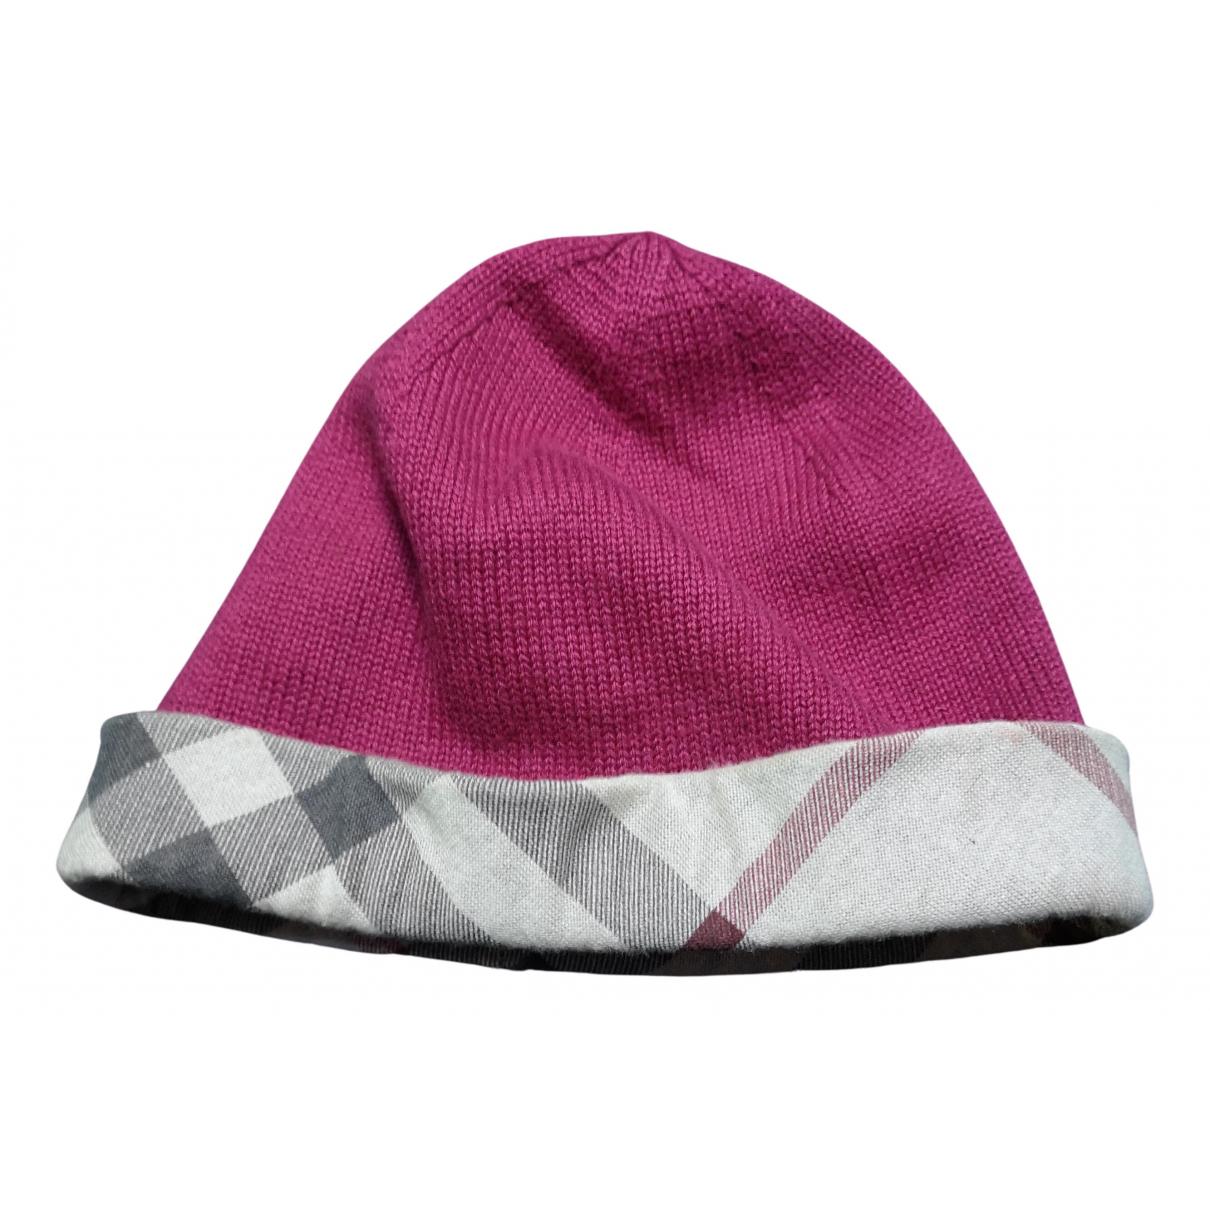 Burberry \N Burgundy Cotton hat & Gloves for Kids \N